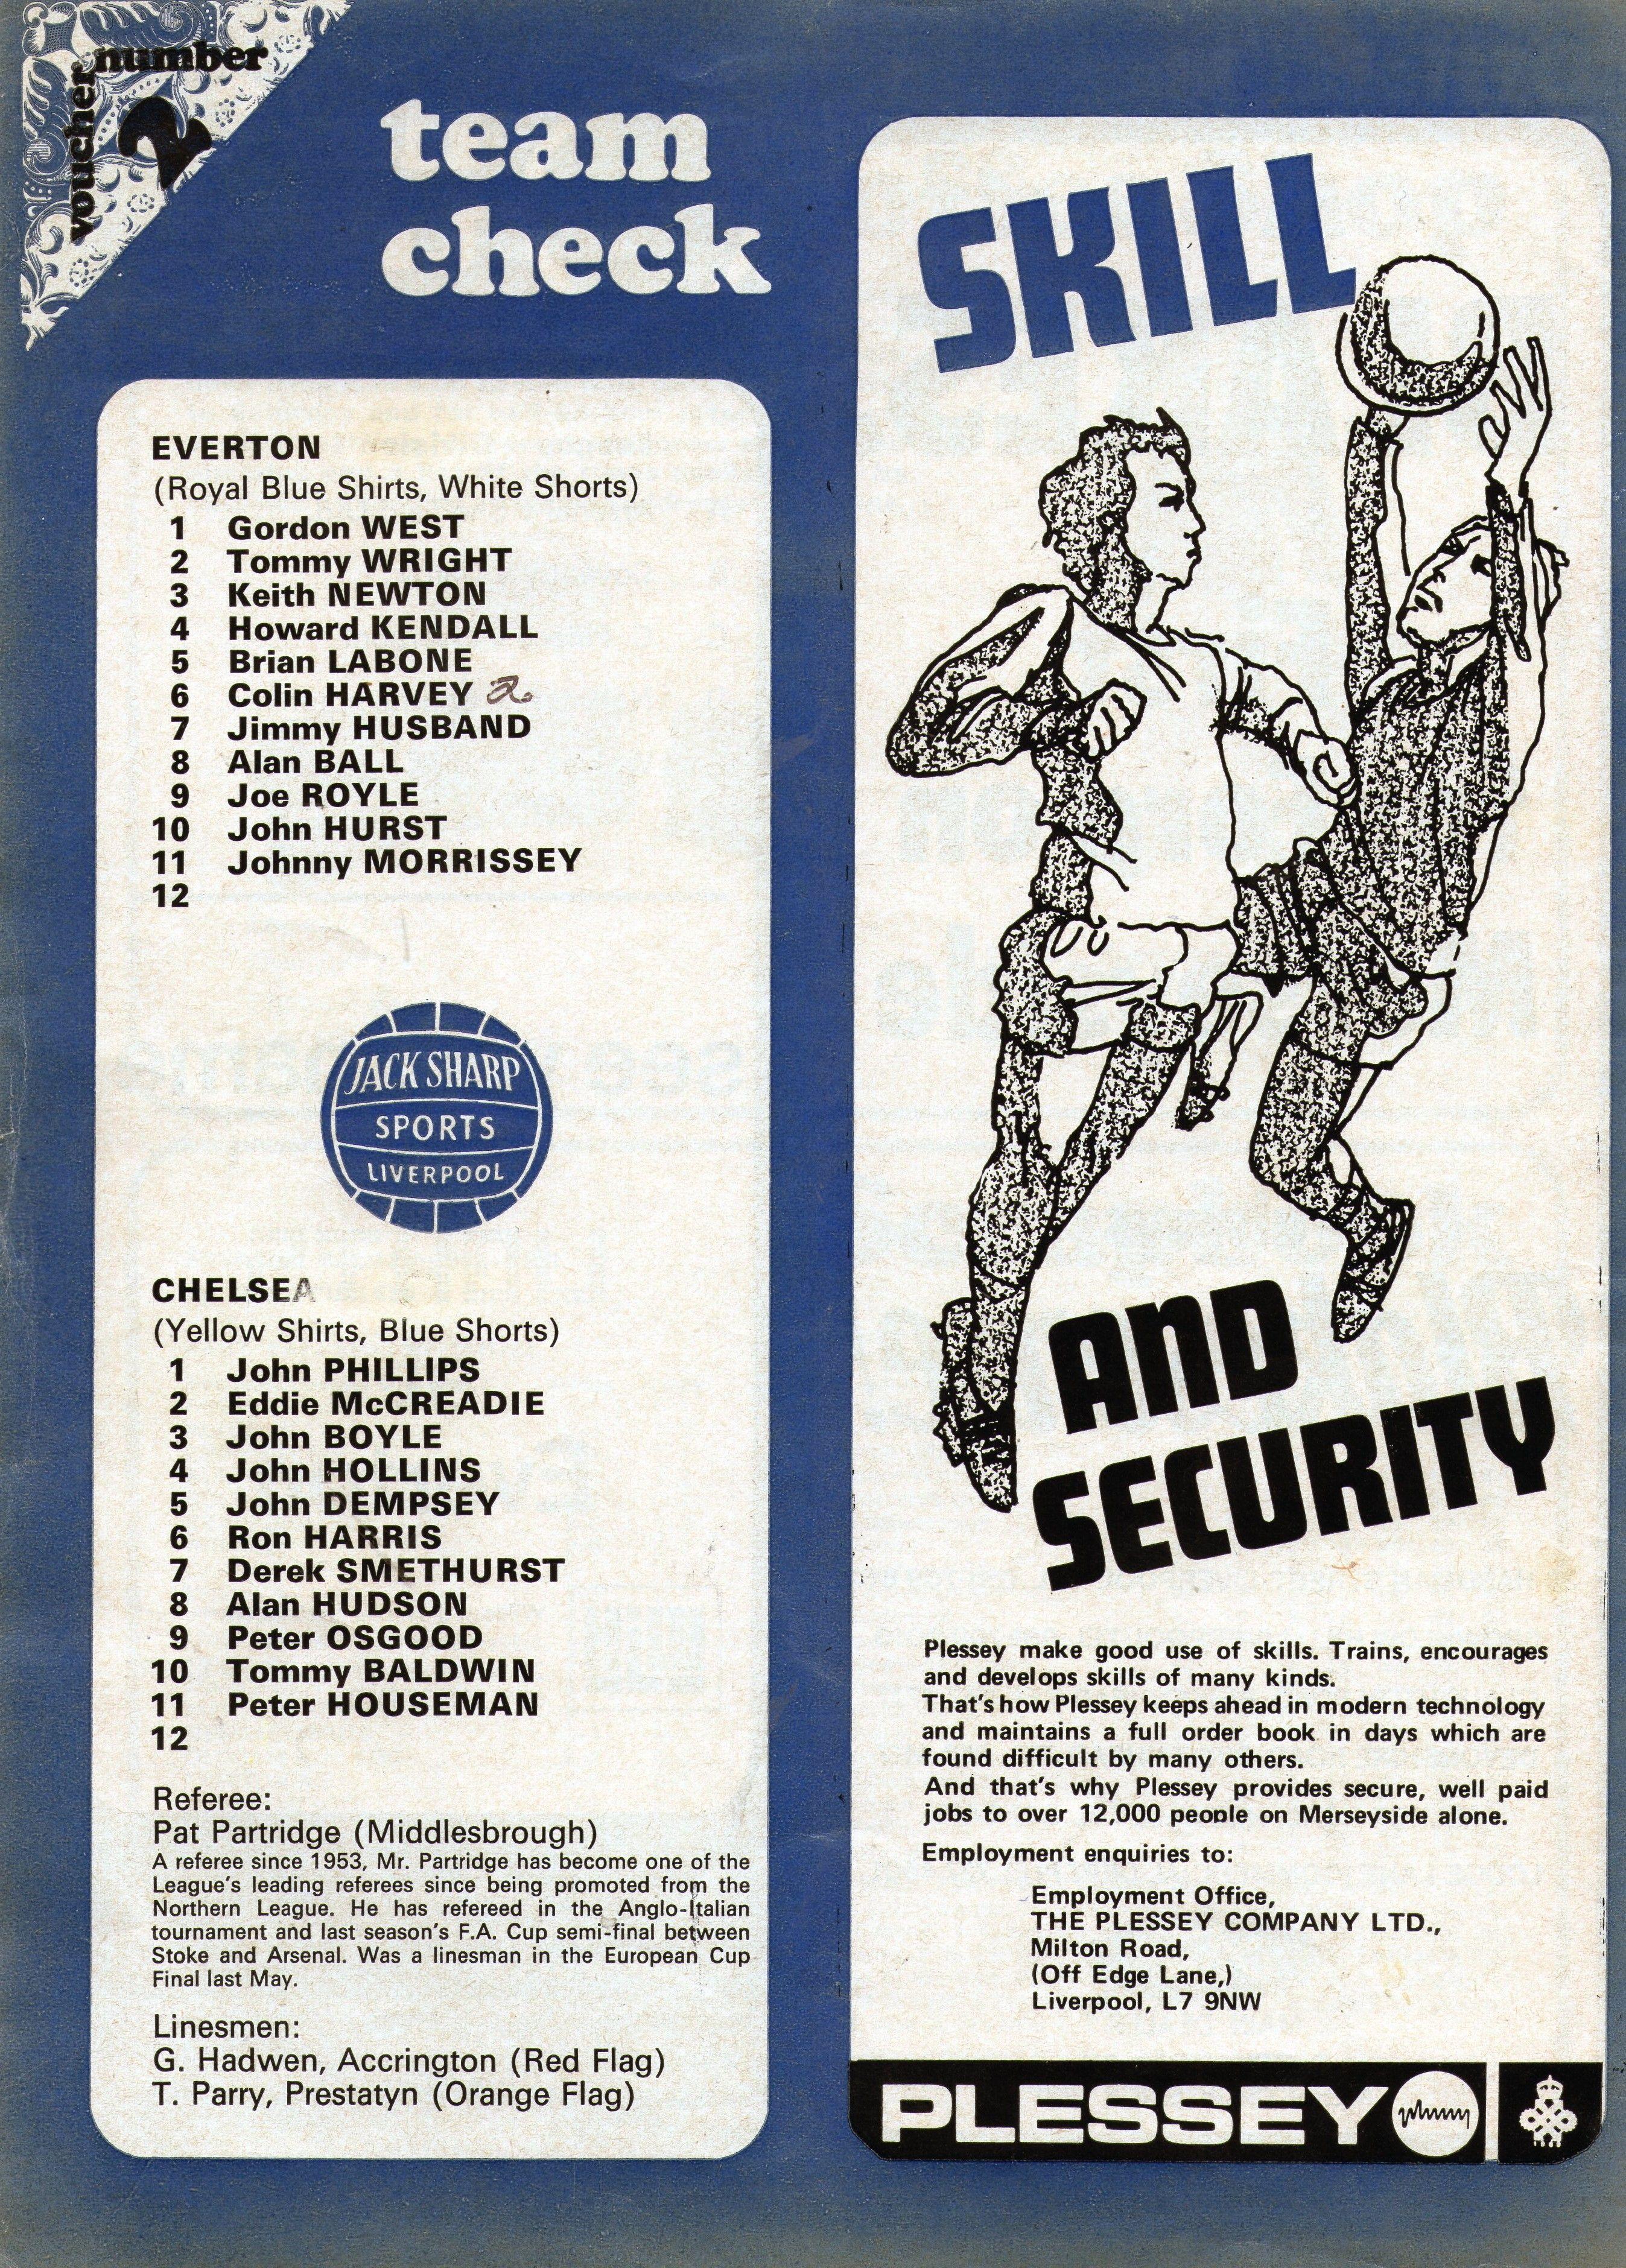 Everton v Chelsea 197172 match day programme team sheet